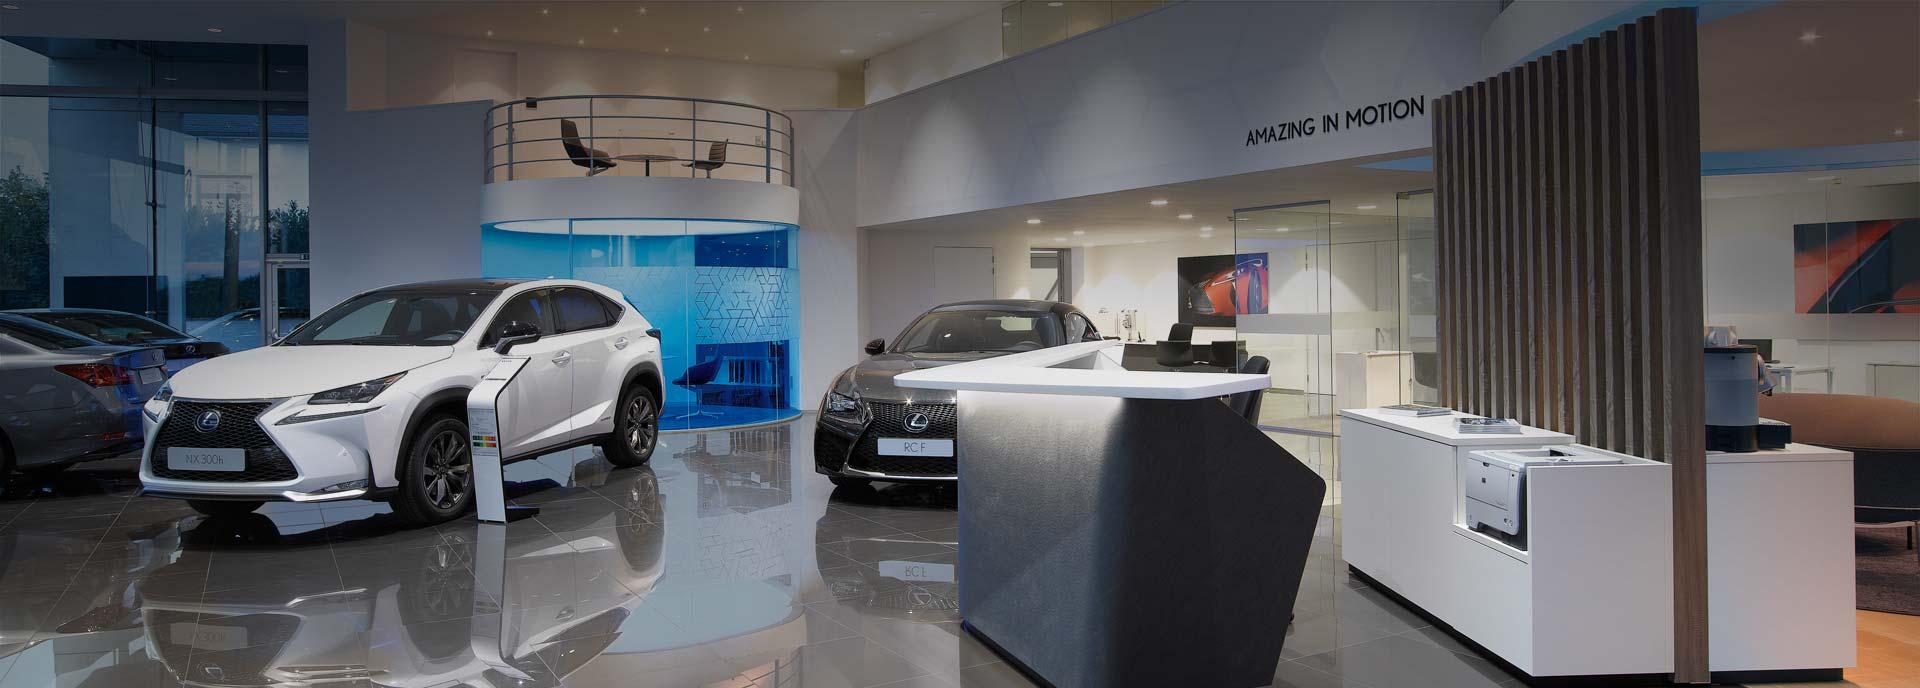 Interno di un concessionario Lexus con una NX 300h e una RCF in mostra